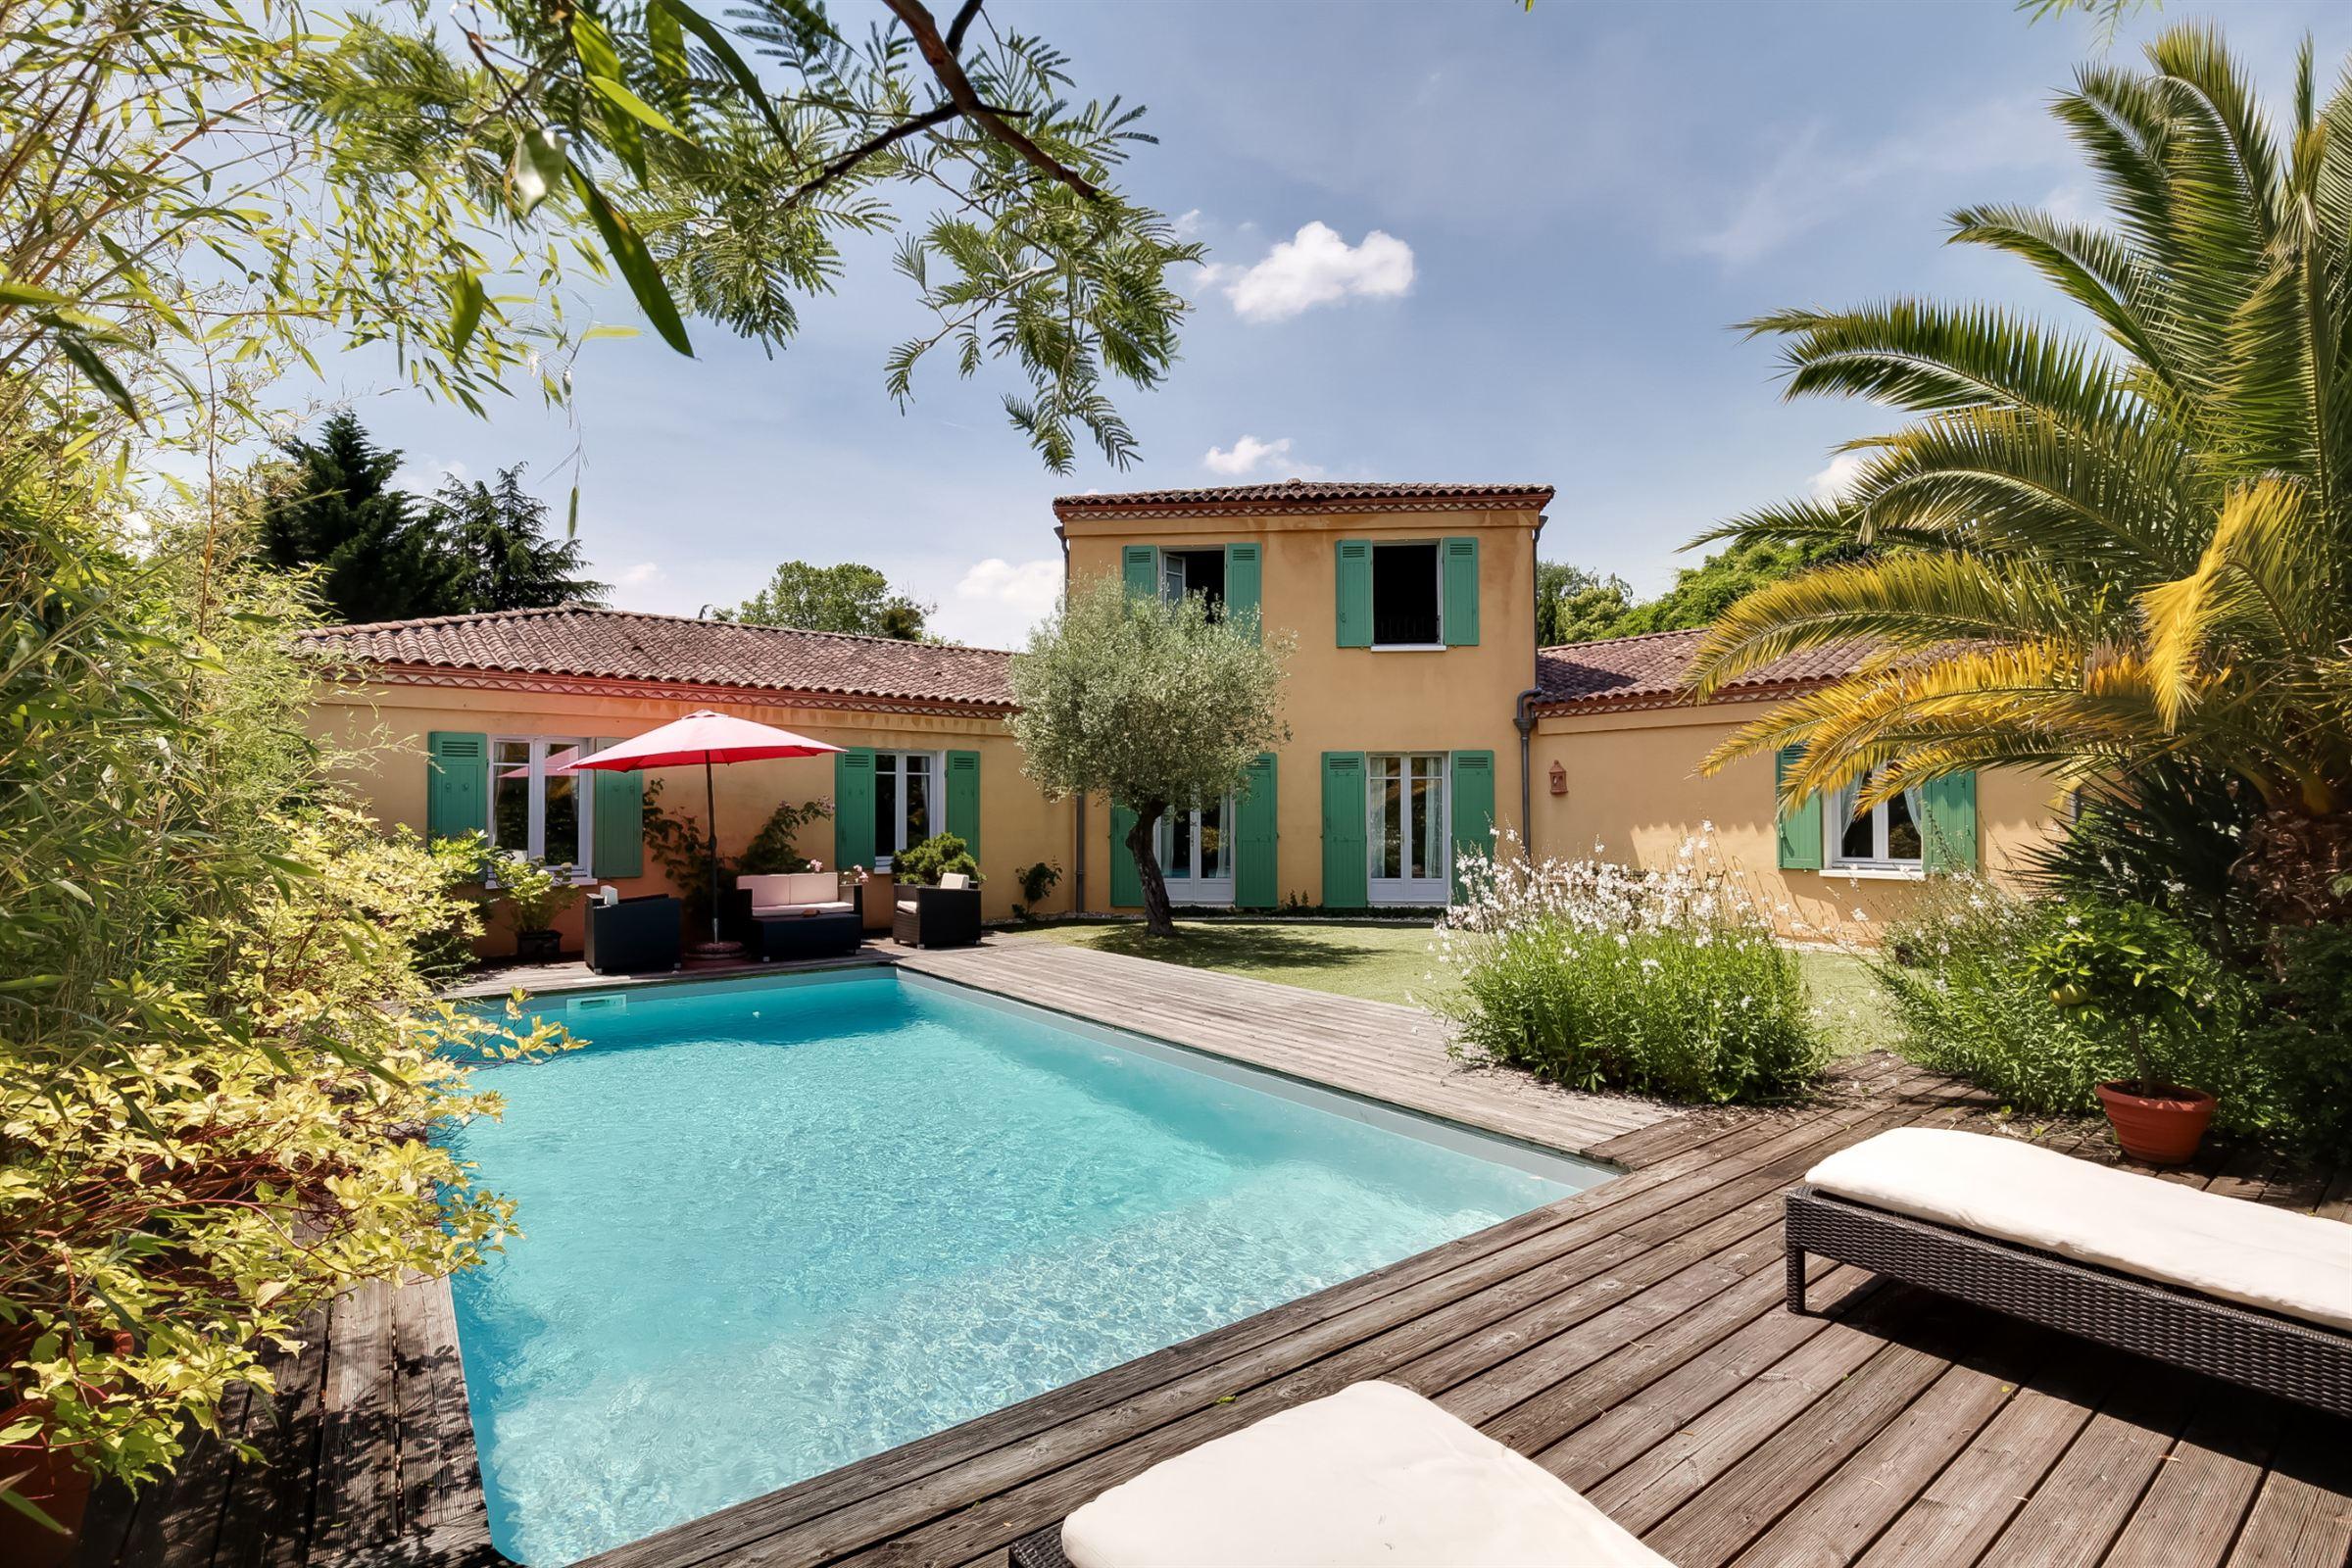 Einfamilienhaus für Verkauf beim BORDEAUX – NEAR THE BORDELAIS GOLF COURSE - BEAUTIFUL HOME WITH LARGE GARDEN Bordeaux, Aquitanien, 33200 Frankreich